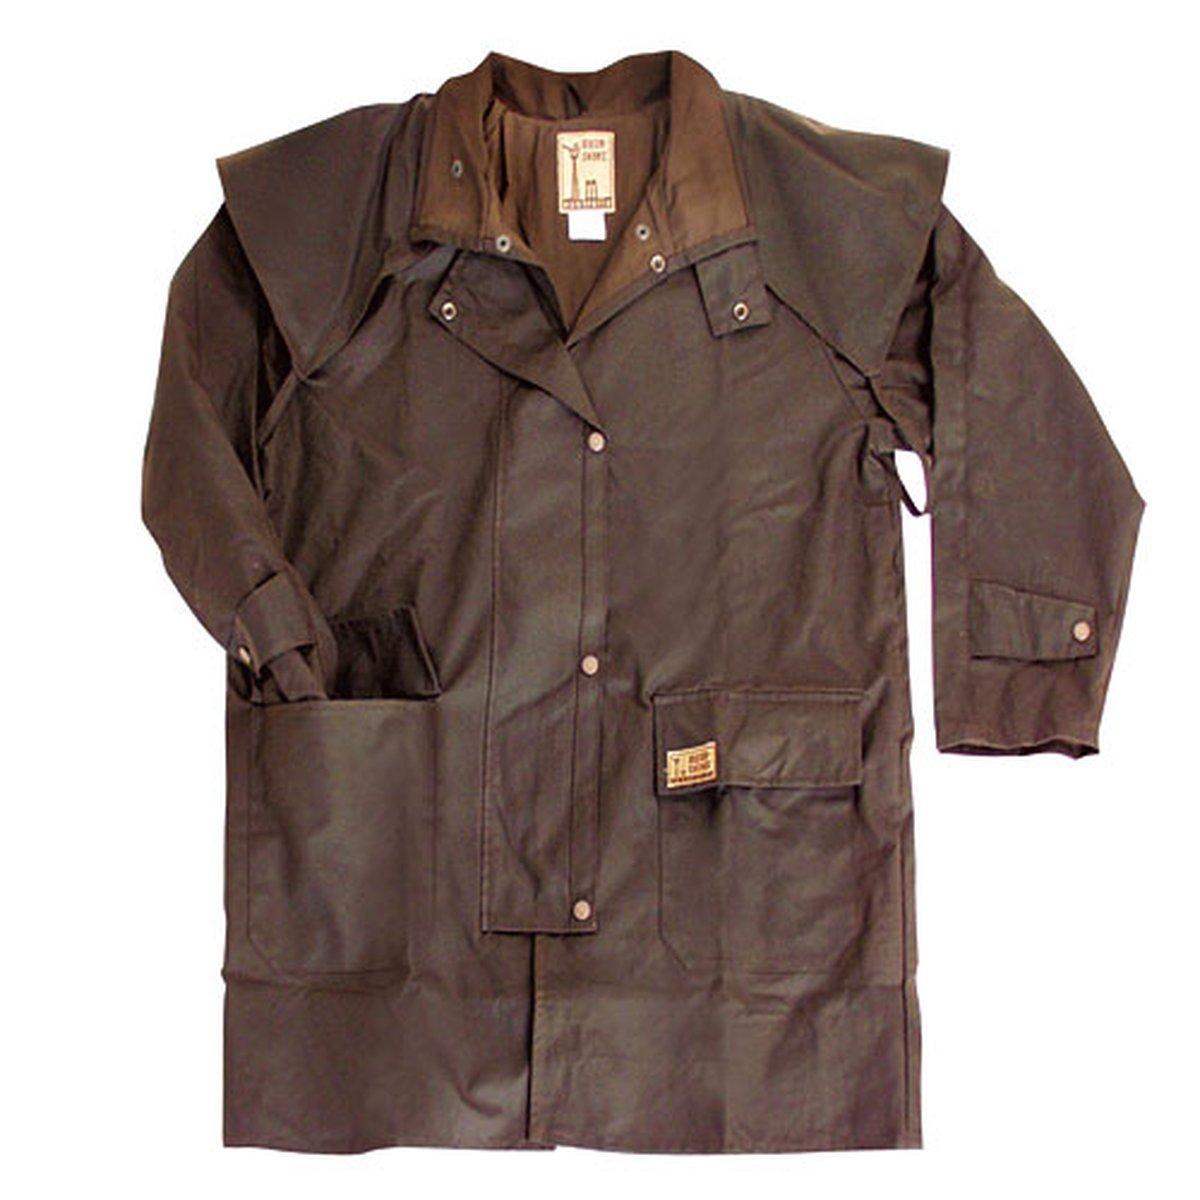 Afbeelding van Bush Skin Riding Jacket Bruin L